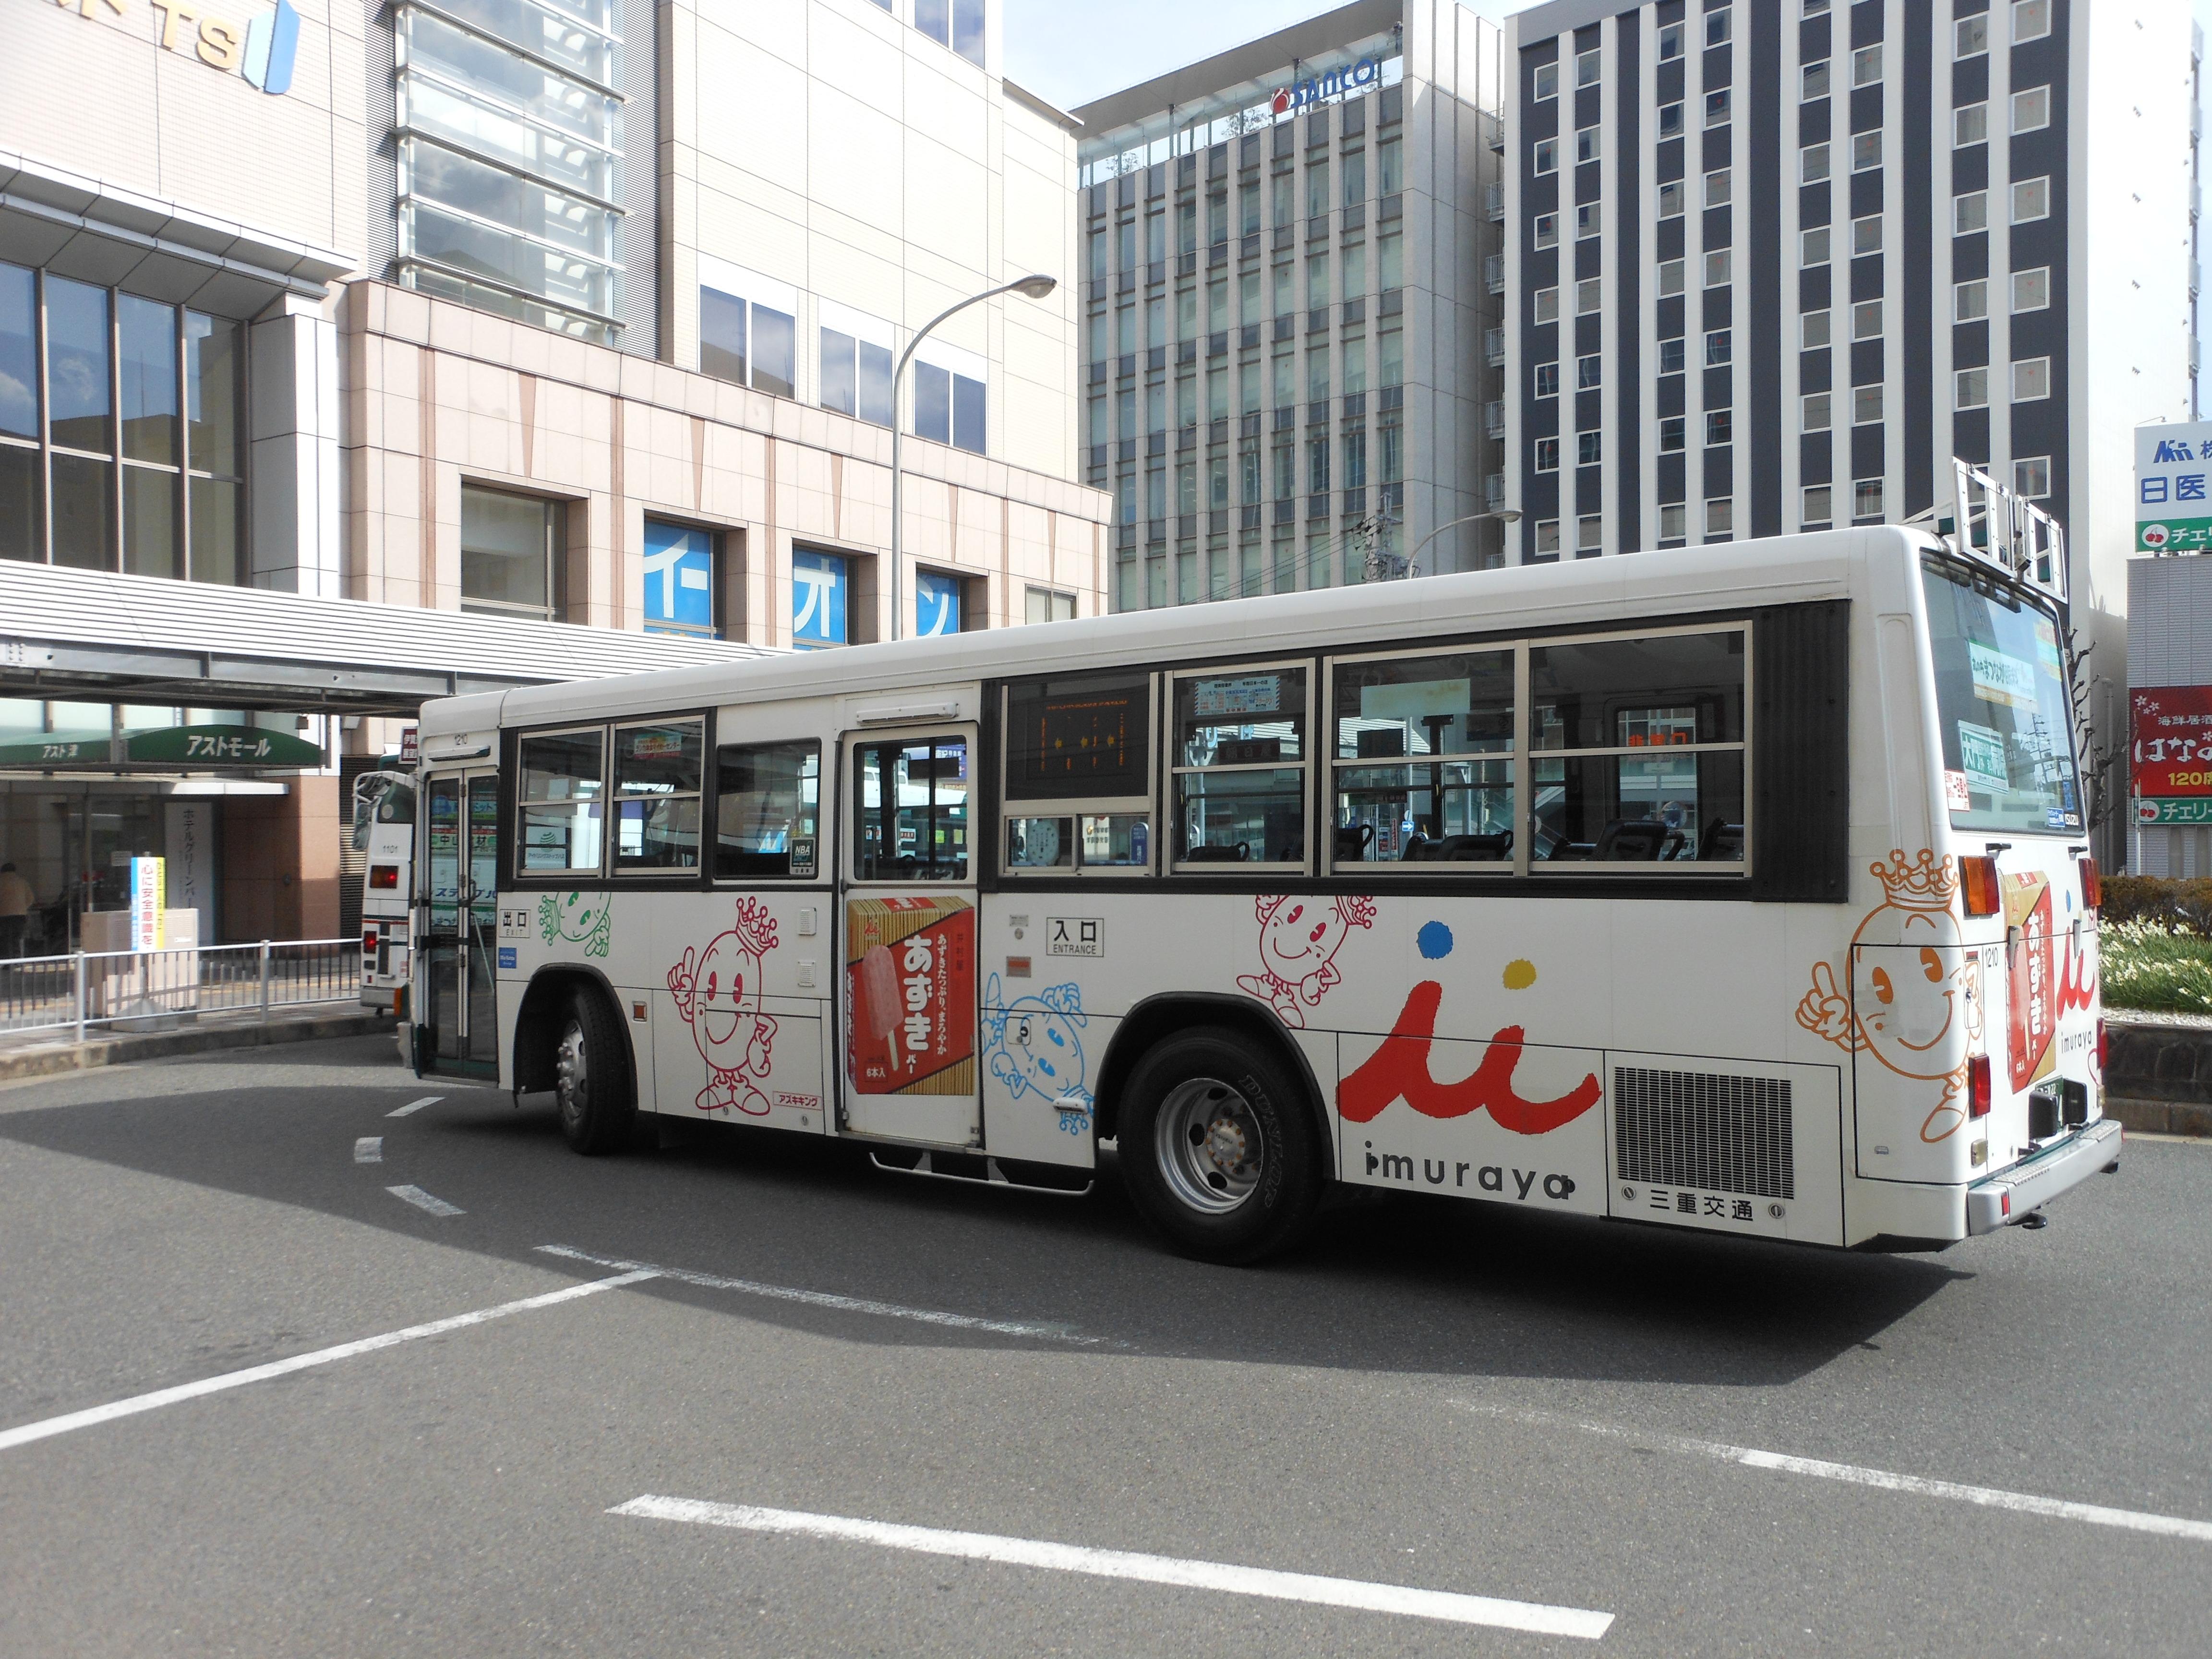 https://upload.wikimedia.org/wikipedia/commons/9/9e/Mie_Kotsu_bus_with_Imuraya.jpg